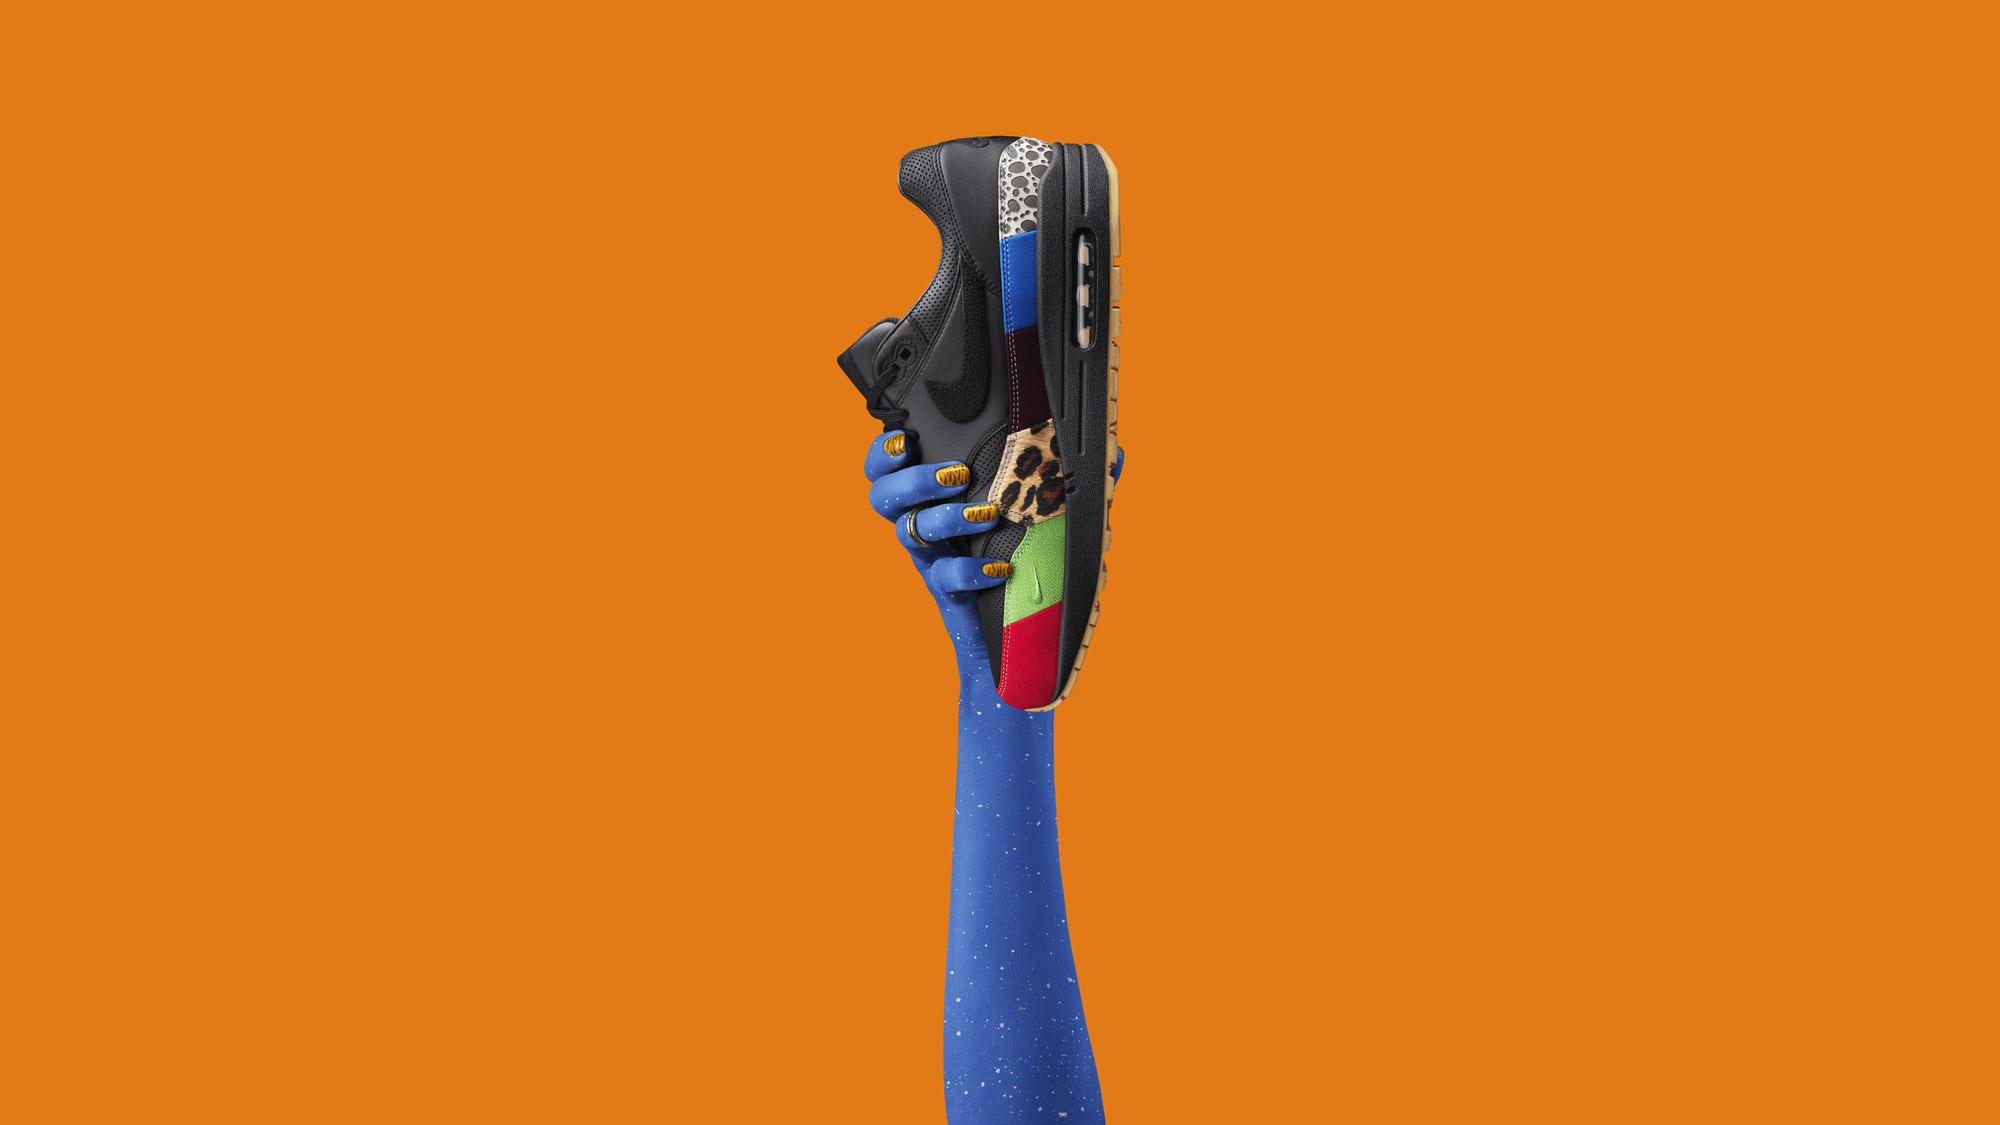 Nike Air Max Day 2017 4